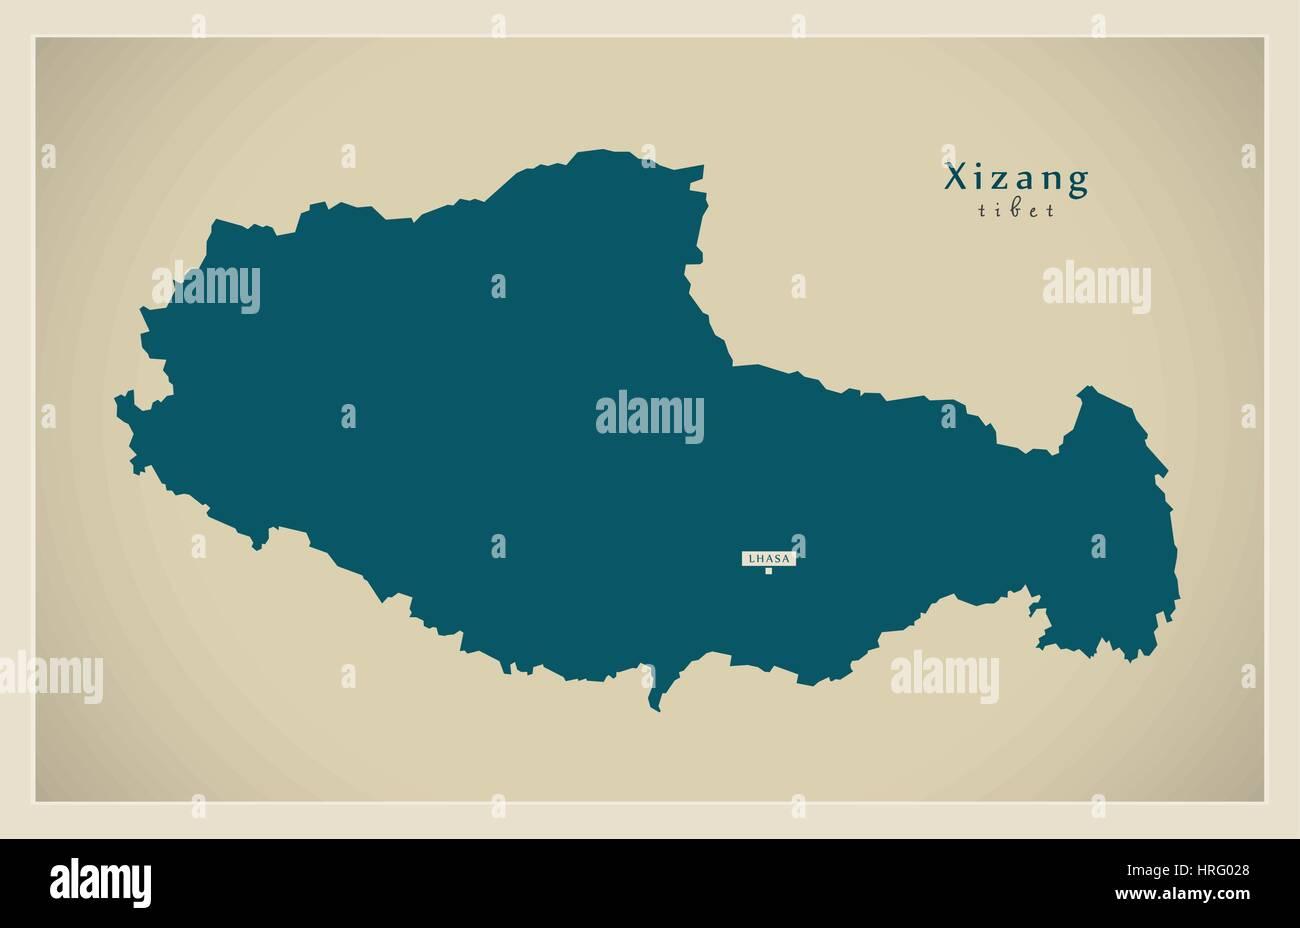 Modern Map - Xizang - Stock Image